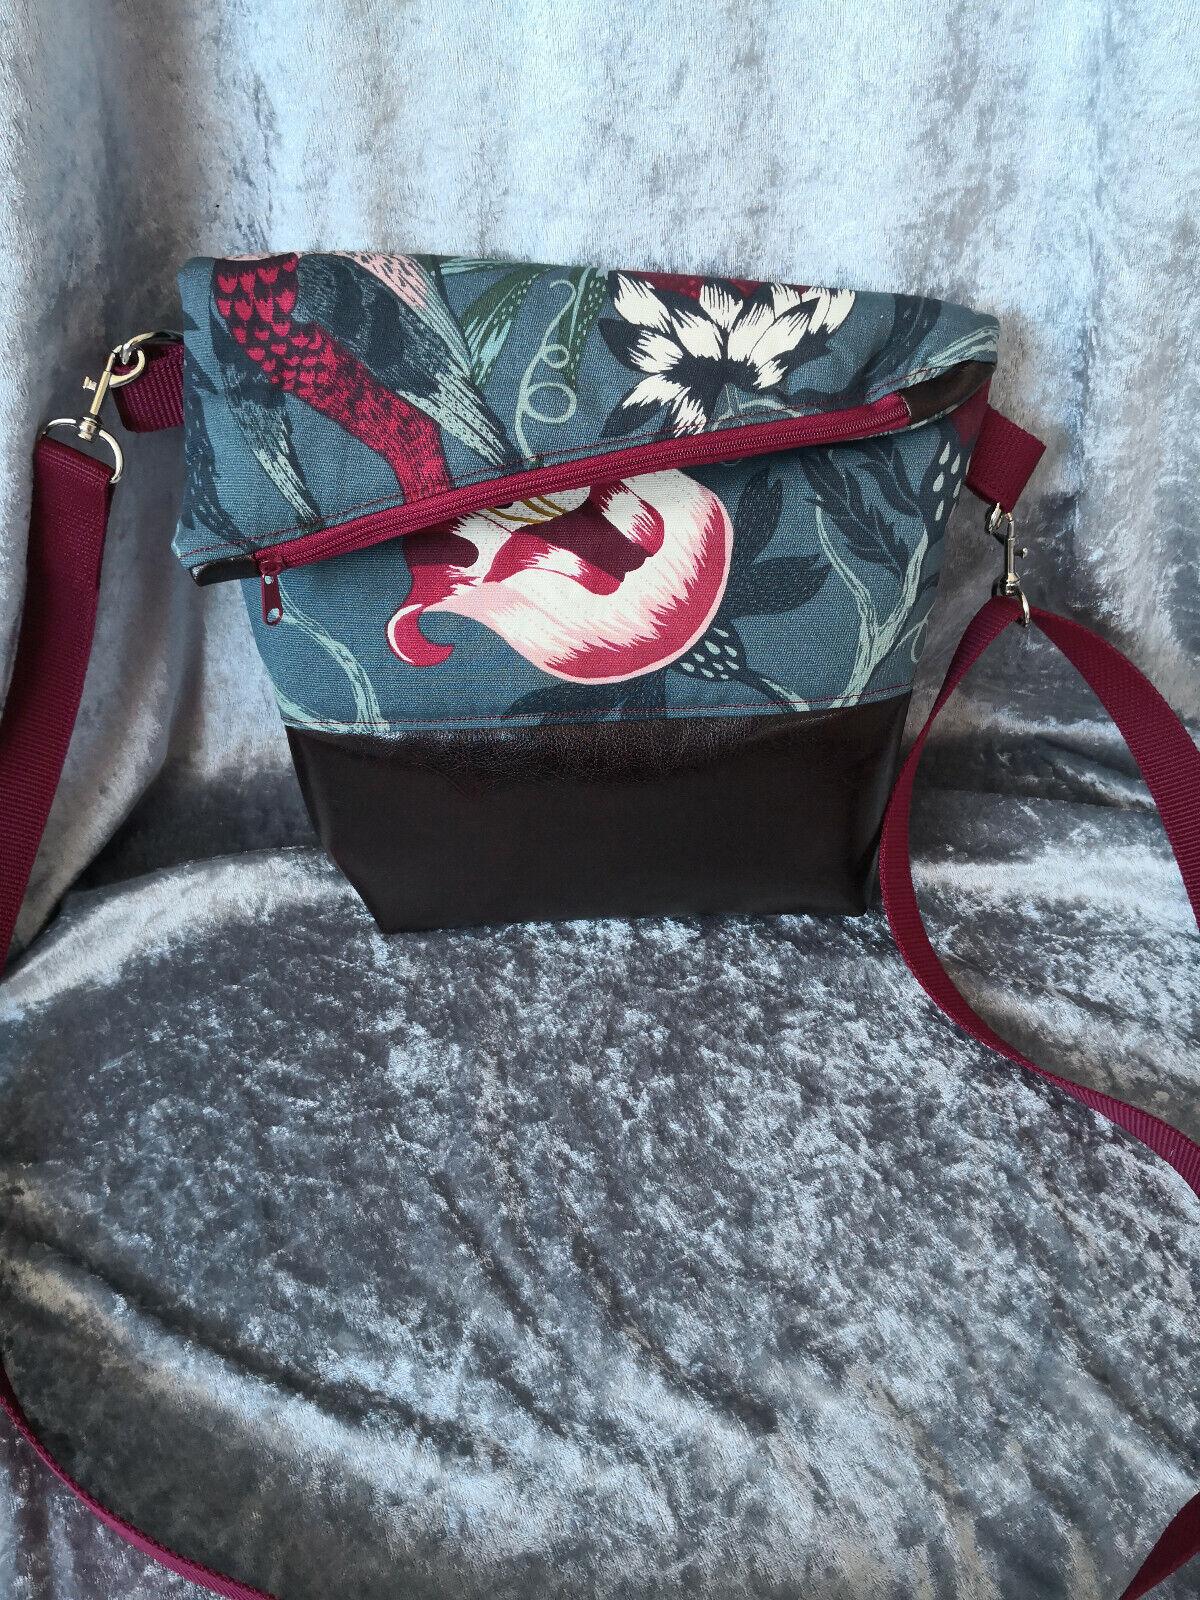 Ausgefallene Damen-Handtasche - Foldover*Bordeaux + Stoff Philodendron Neu